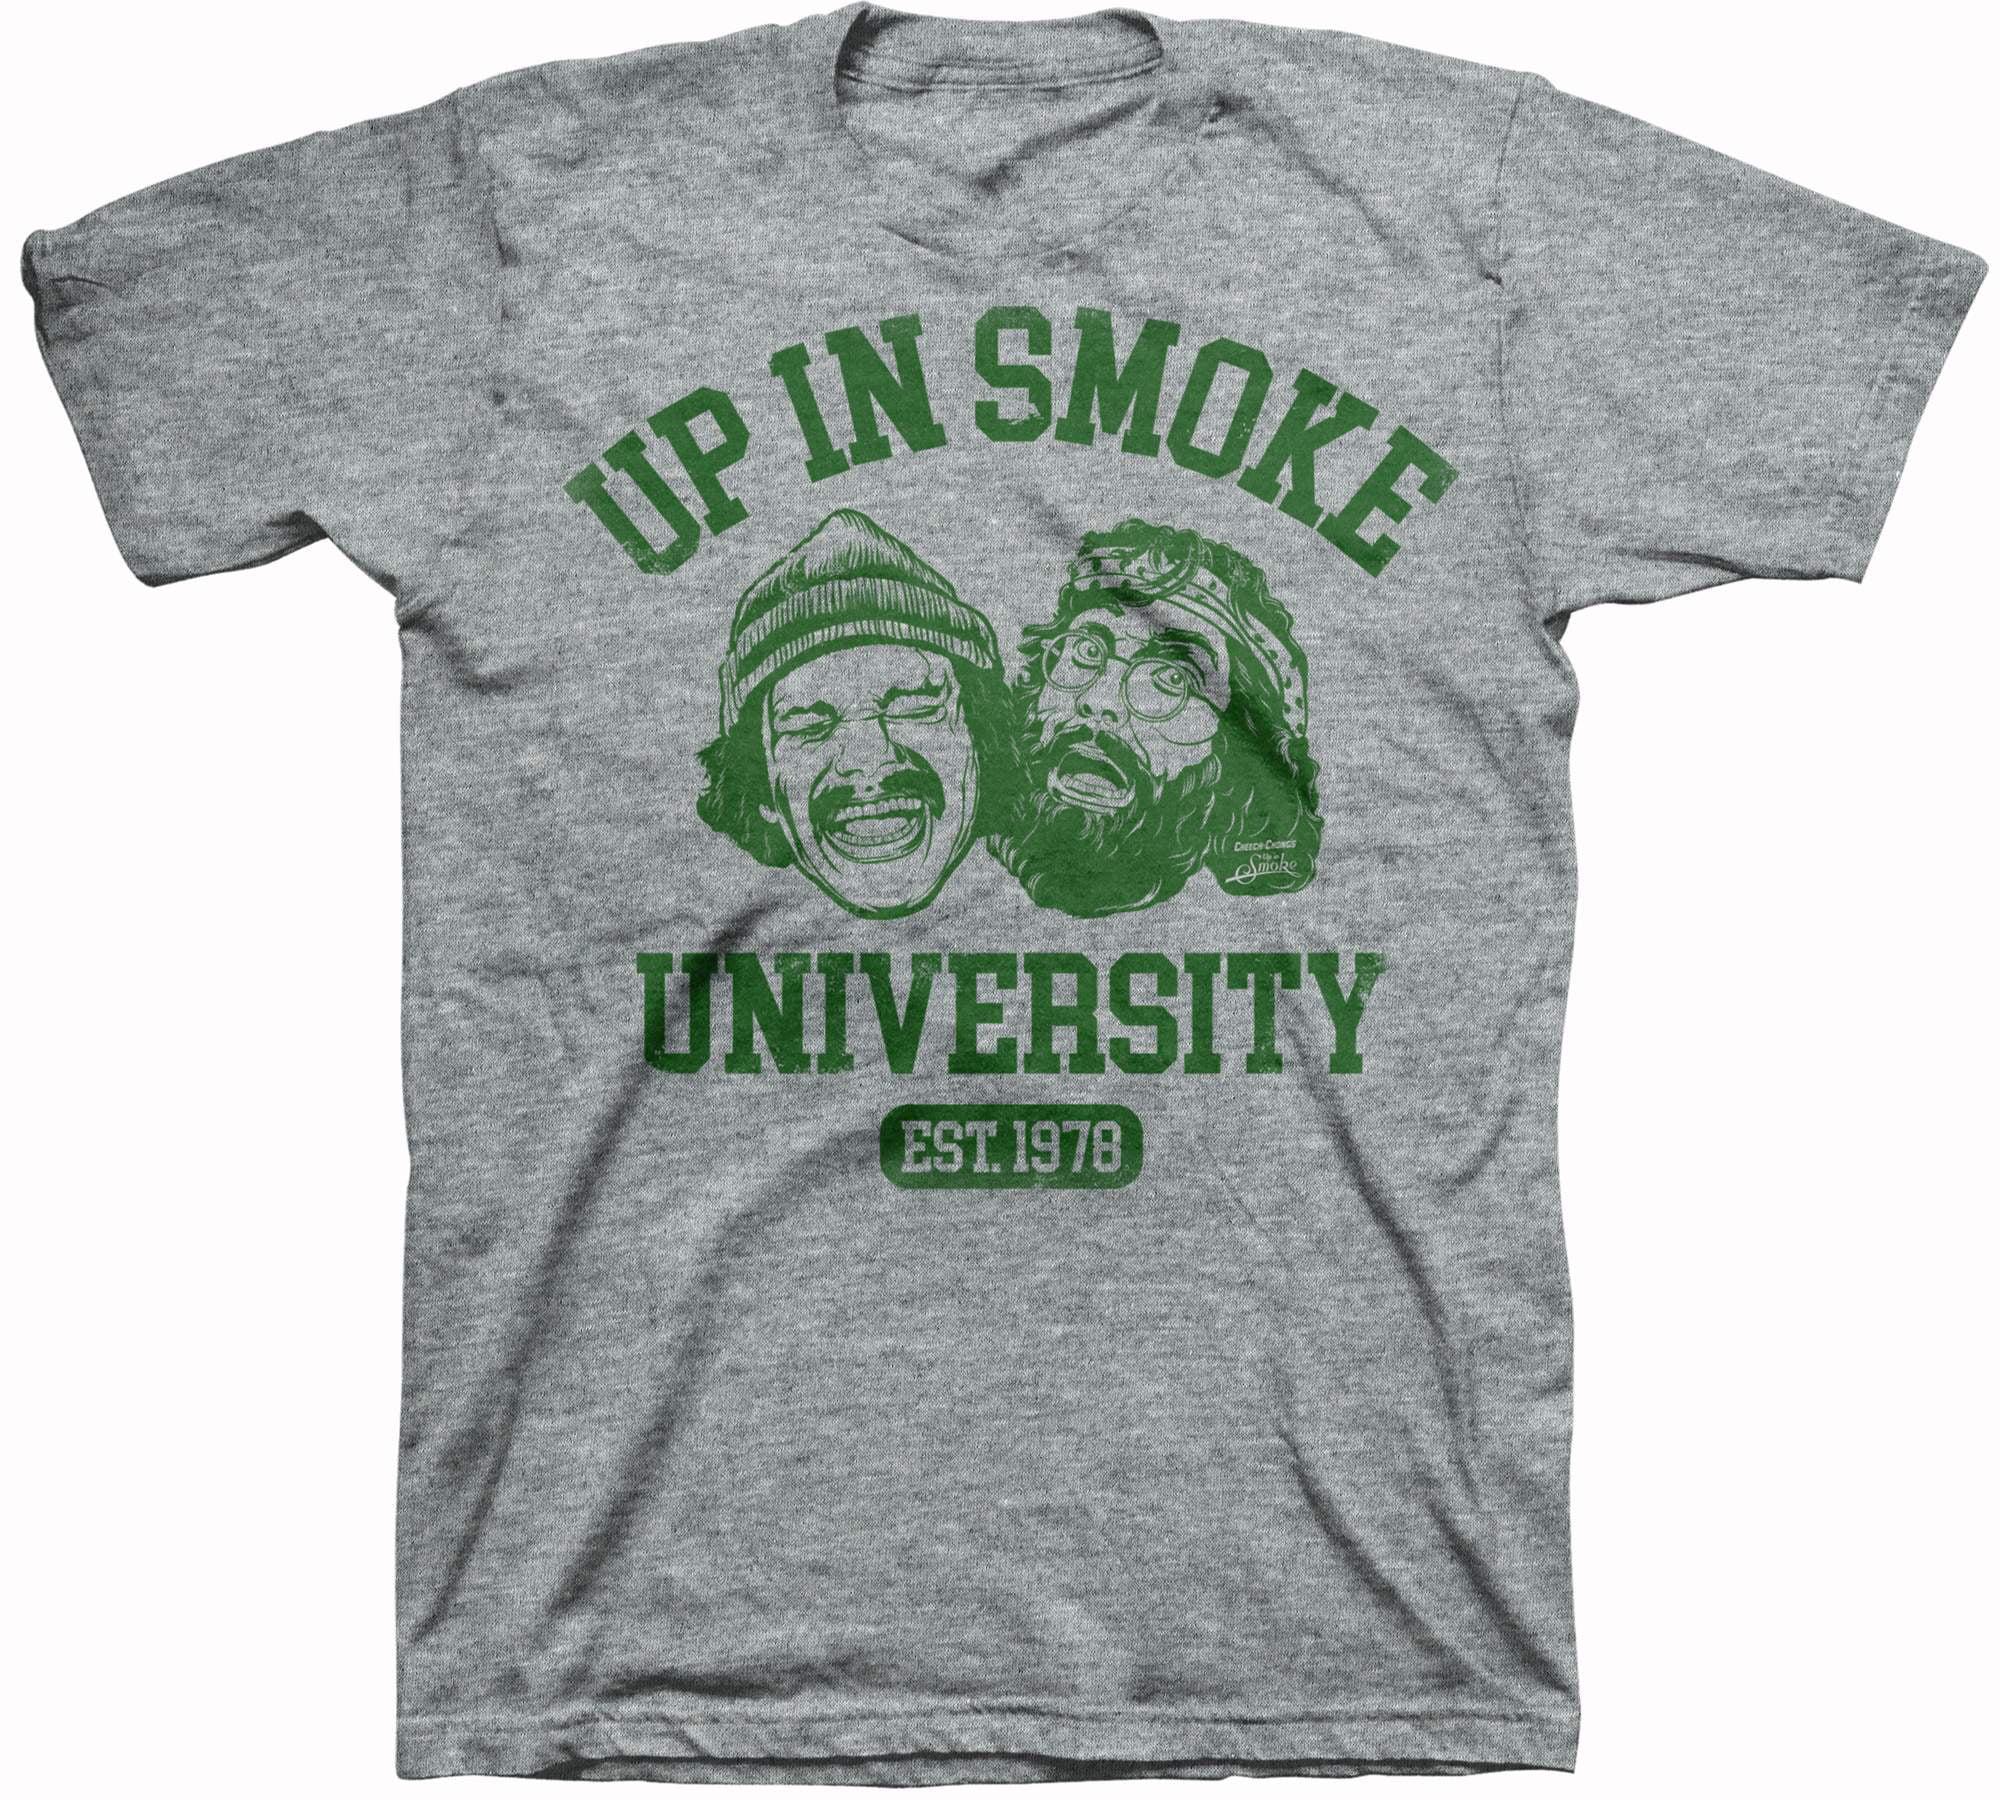 Cheech and Chong Men's Up In Smoke University Graphic T-shirt